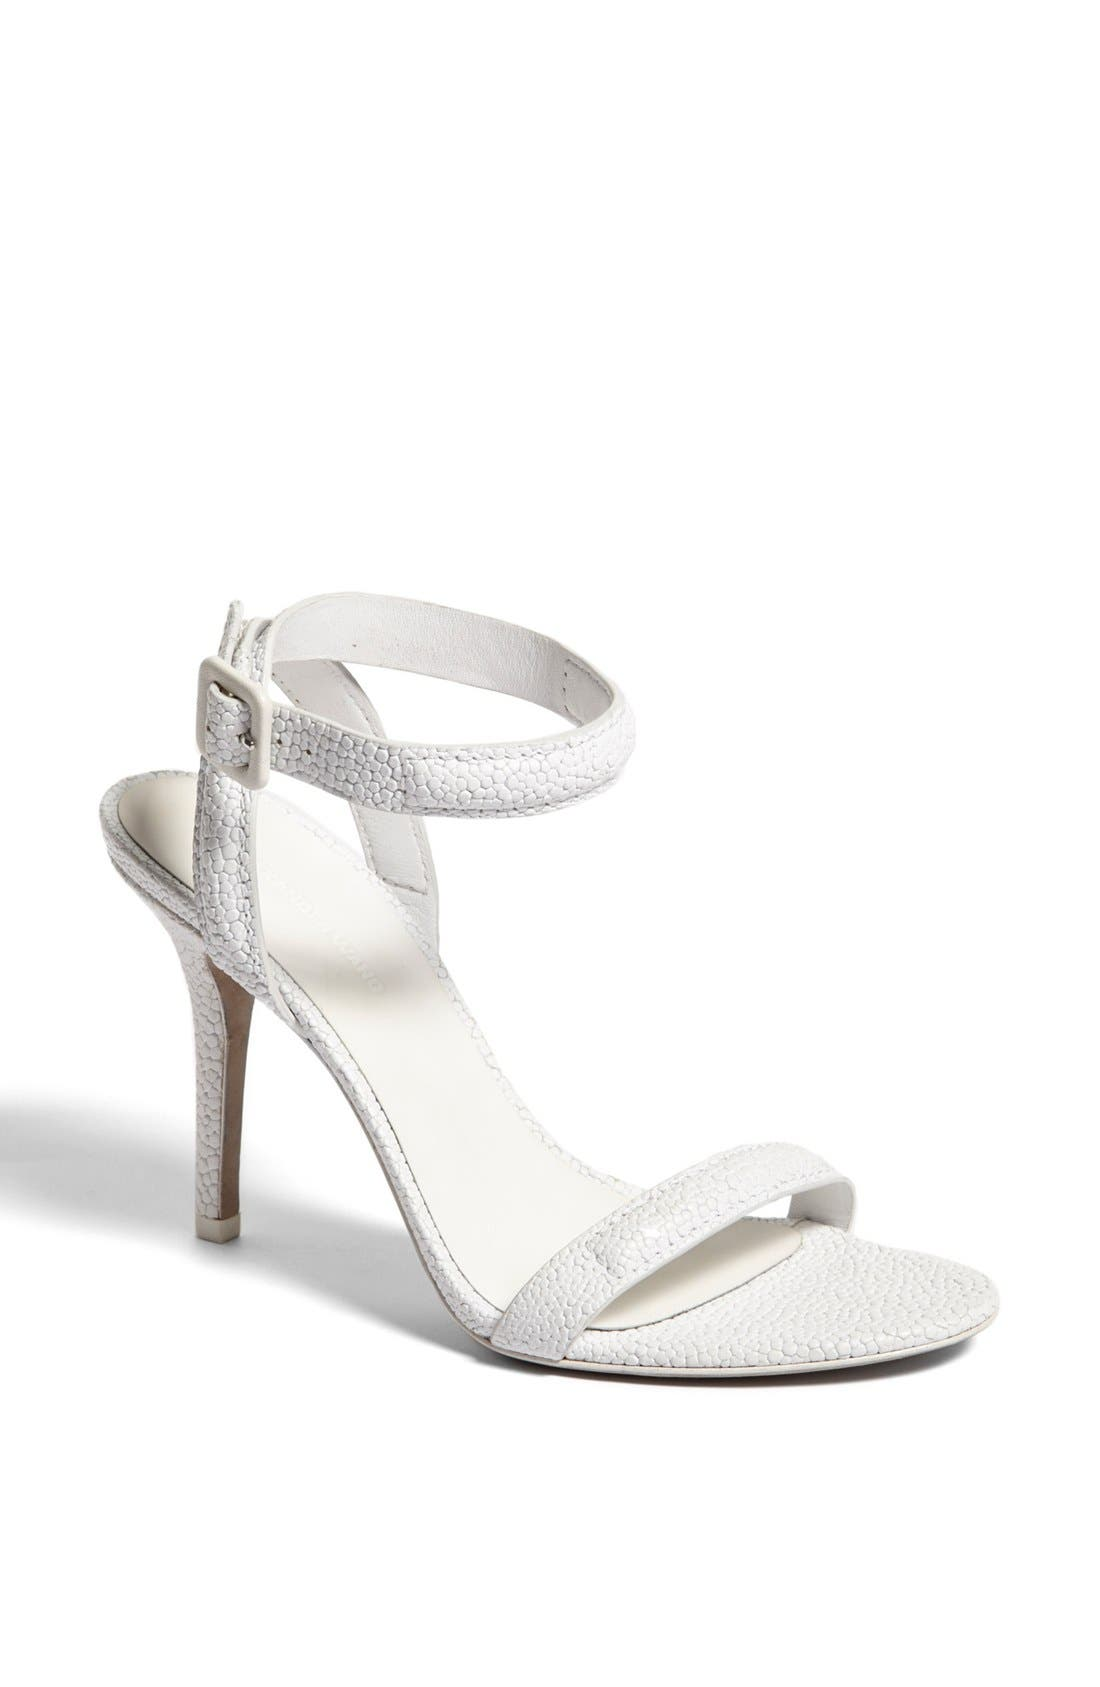 Alternate Image 1 Selected - Alexander Wang 'Antonia' Ankle Strap Sandal